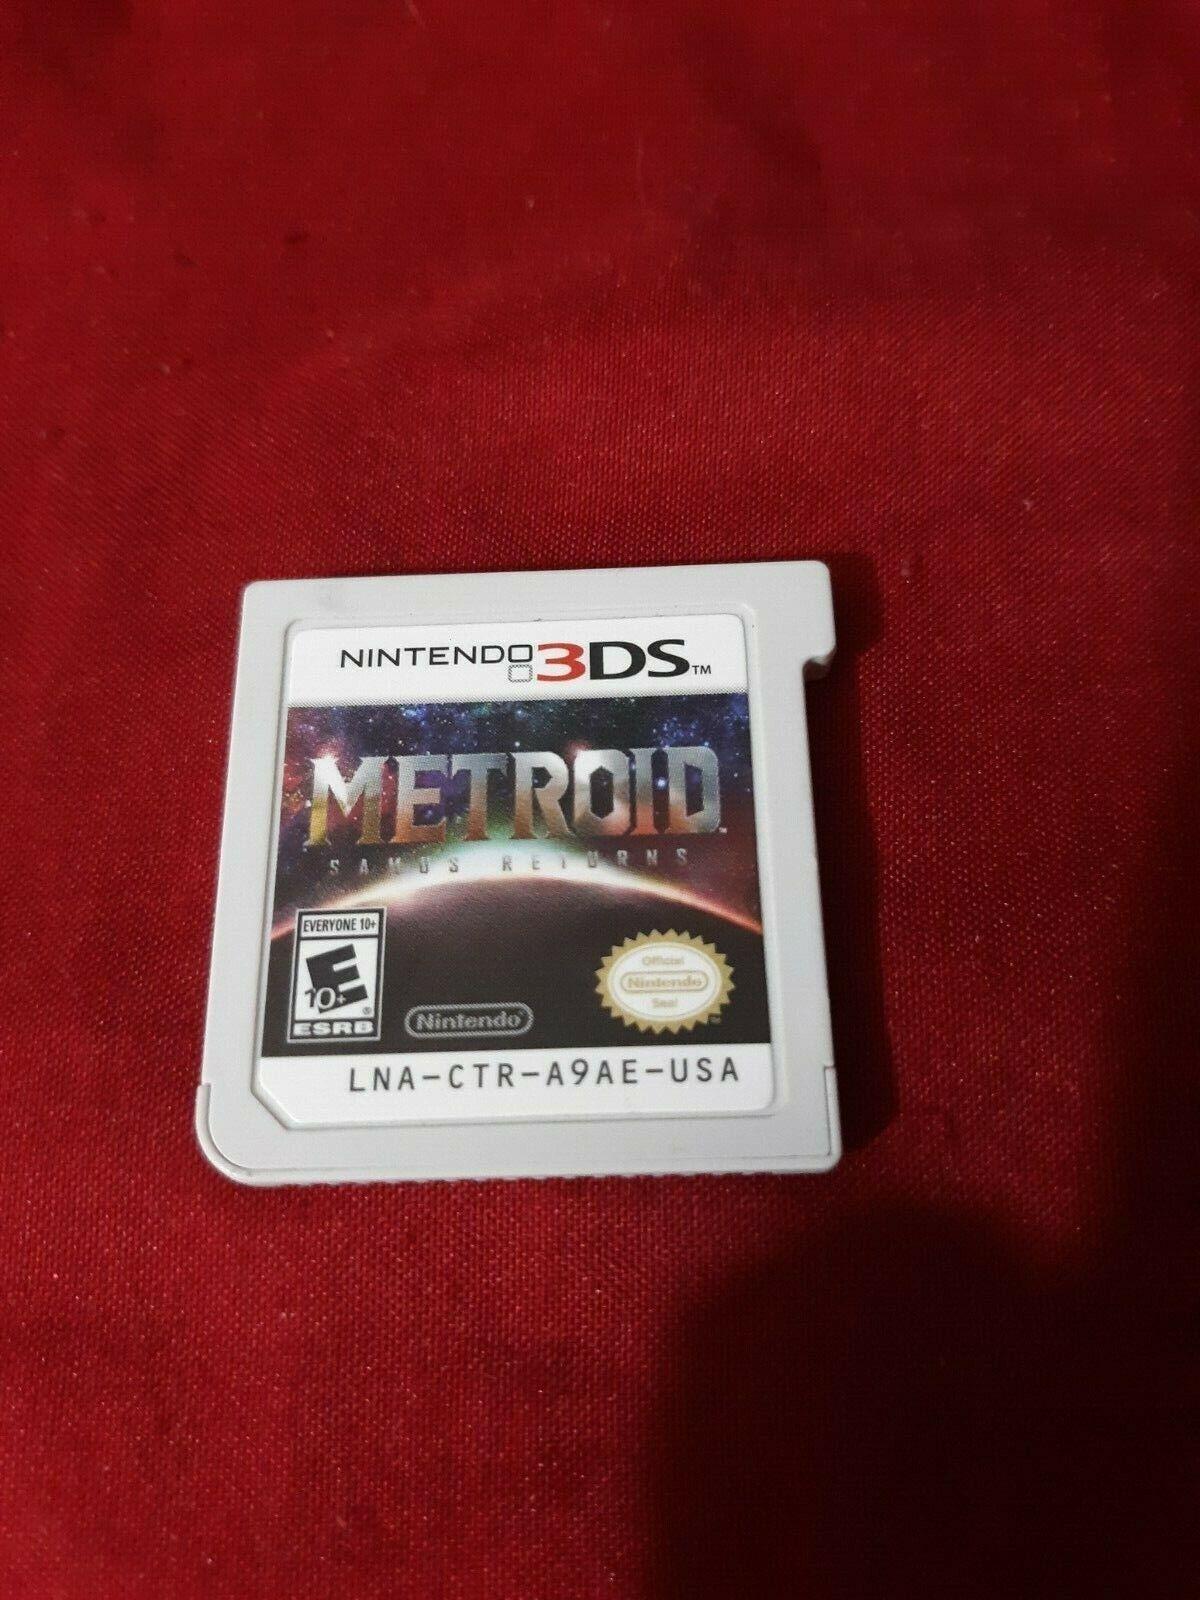 Nintendo 3 DS Game Metroid Samus Returns Oose Game No Case - $19.00